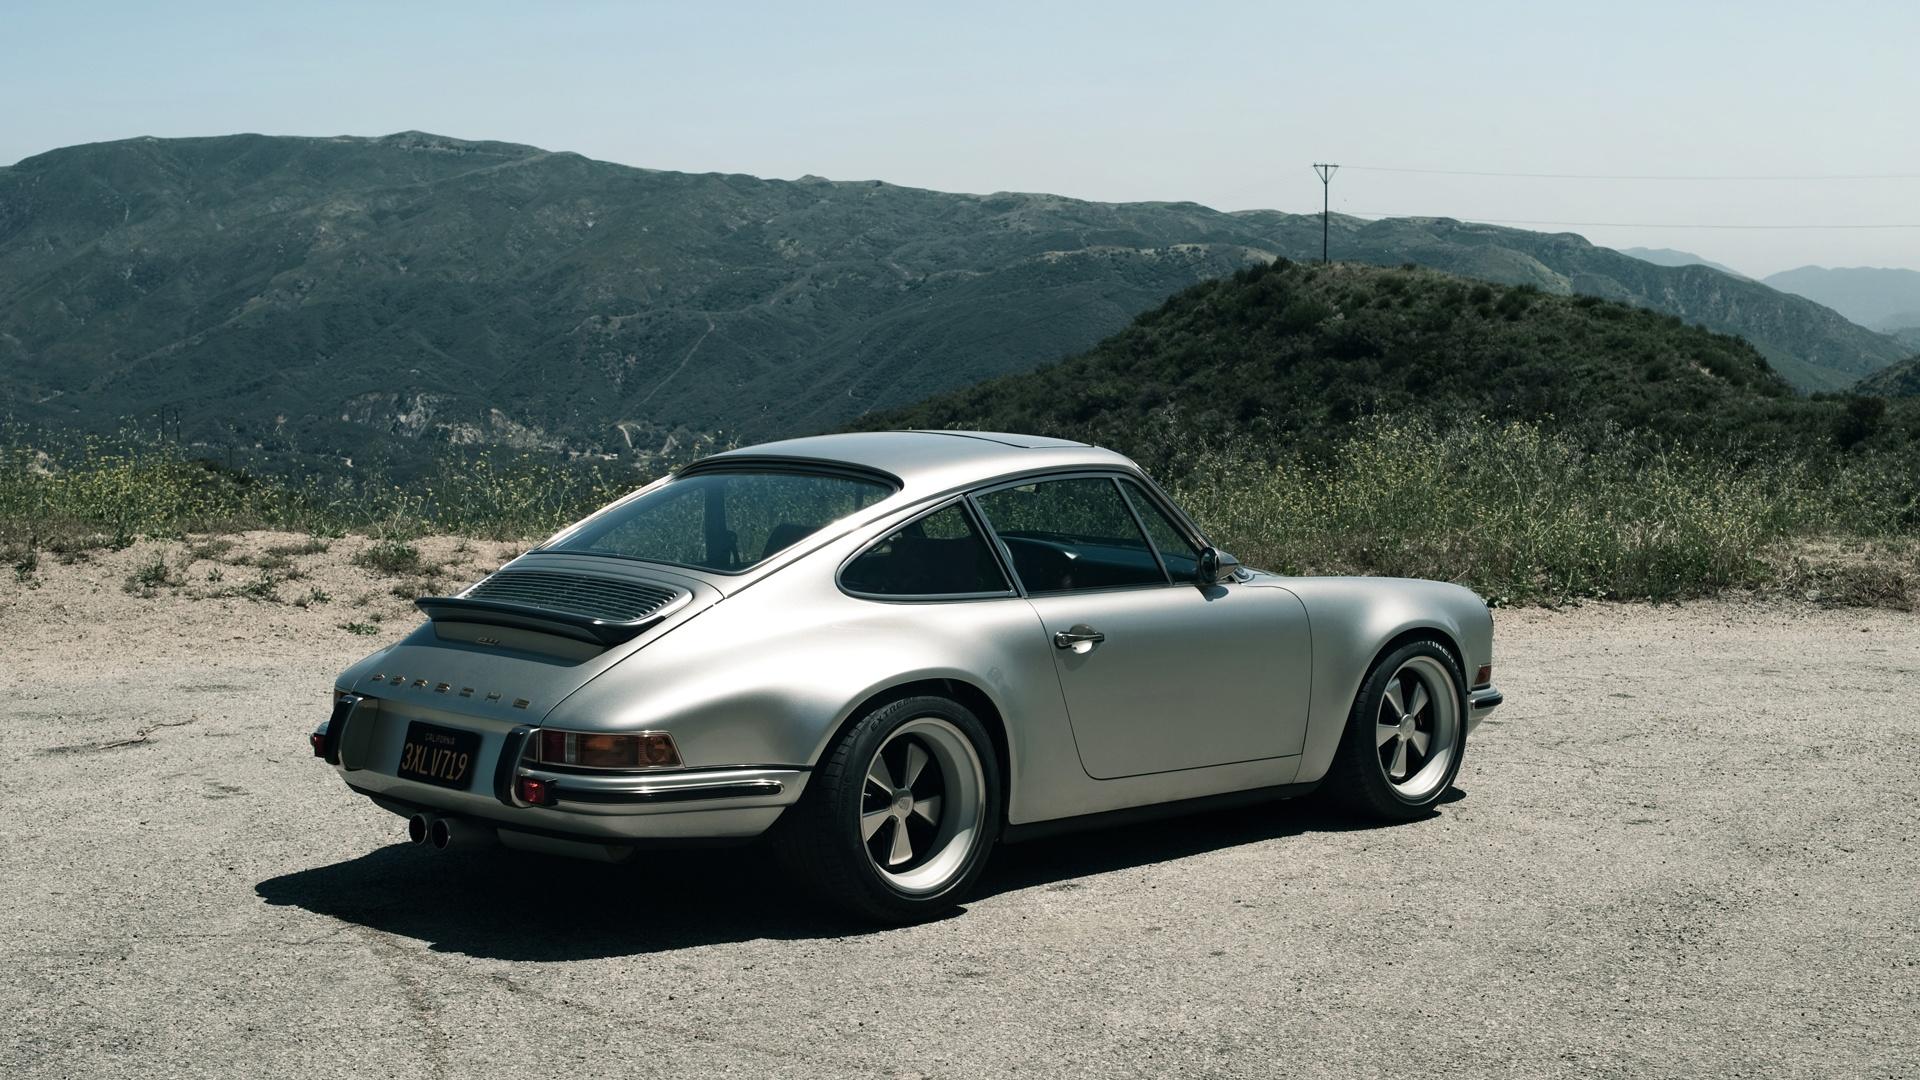 Porsche 911 Classic 2 1920x1080